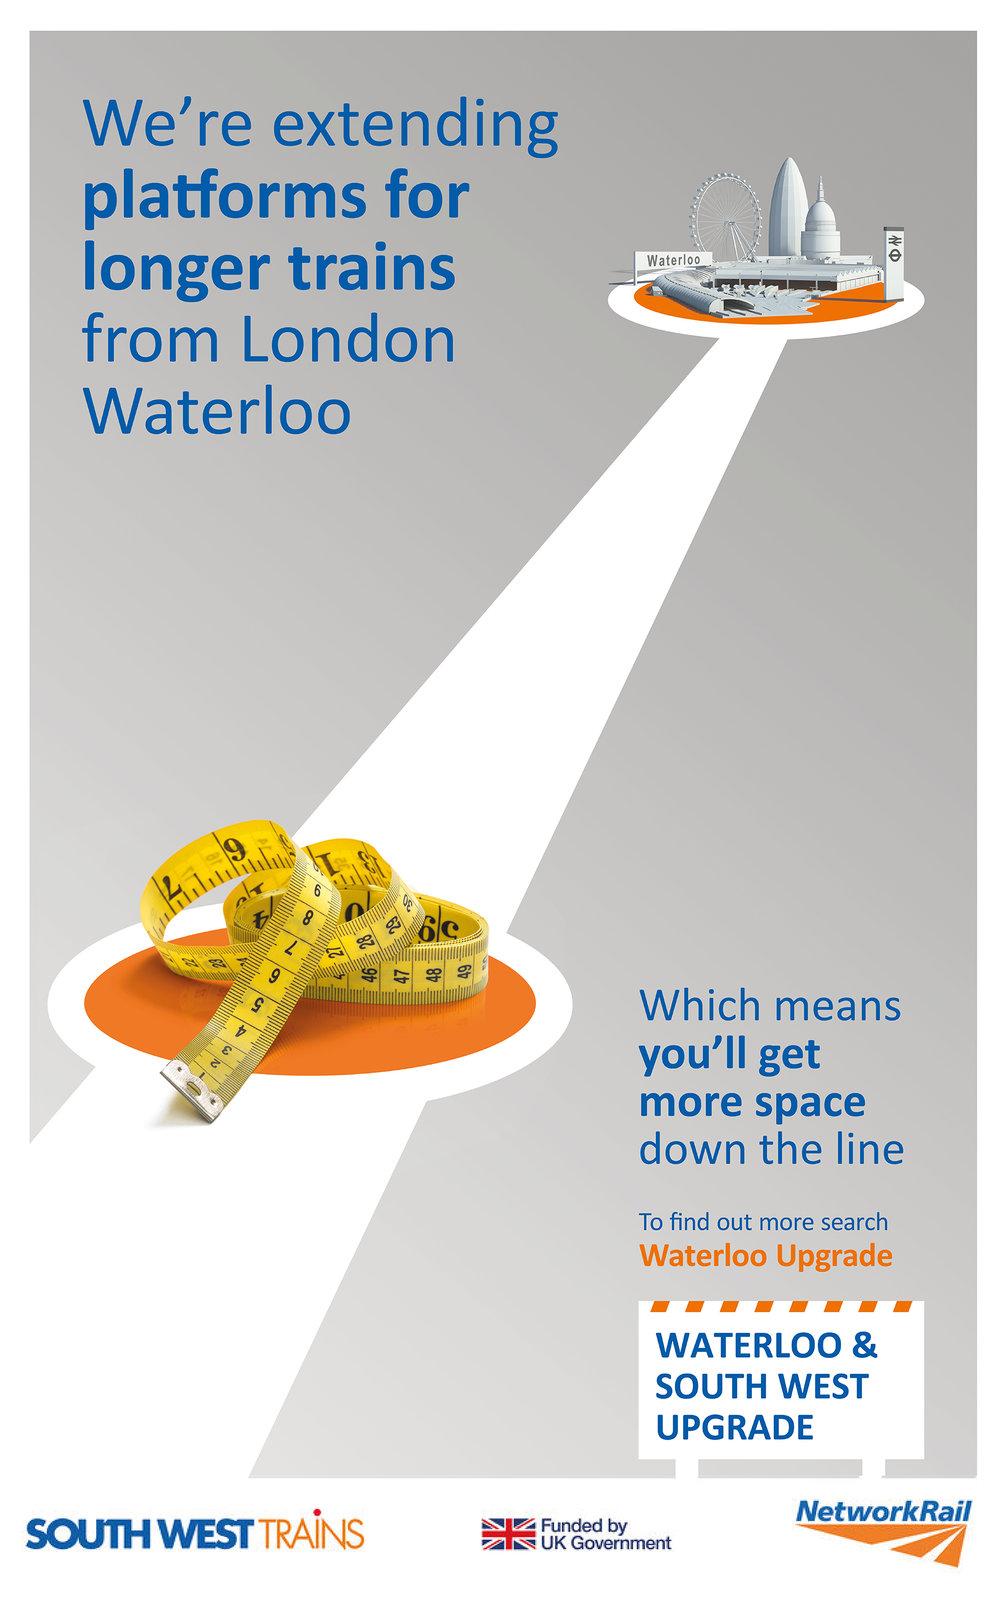 500624_SWT_Waterloo_Benefits_Posters2.jpg